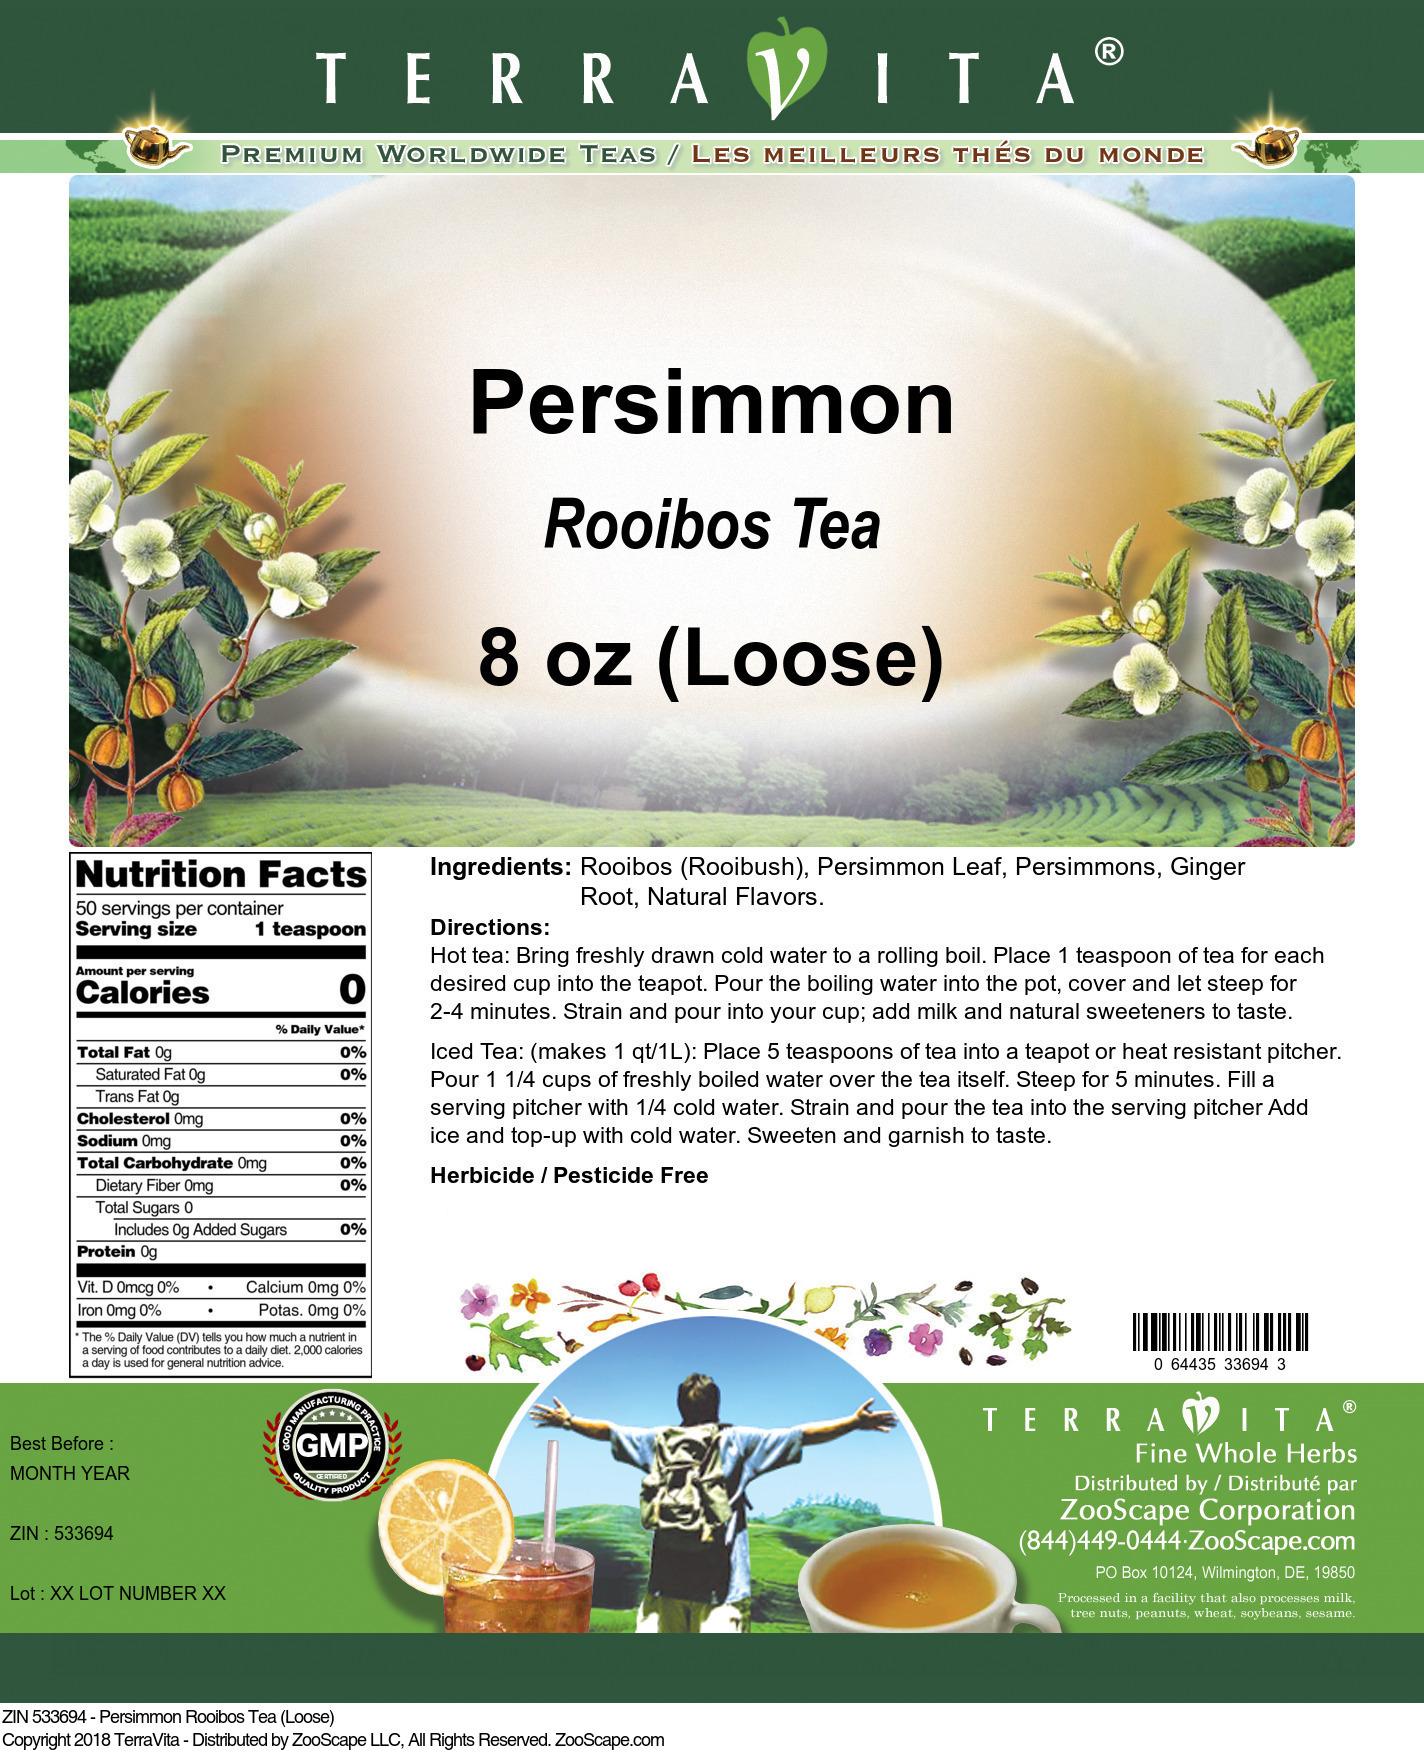 Persimmon Rooibos Tea